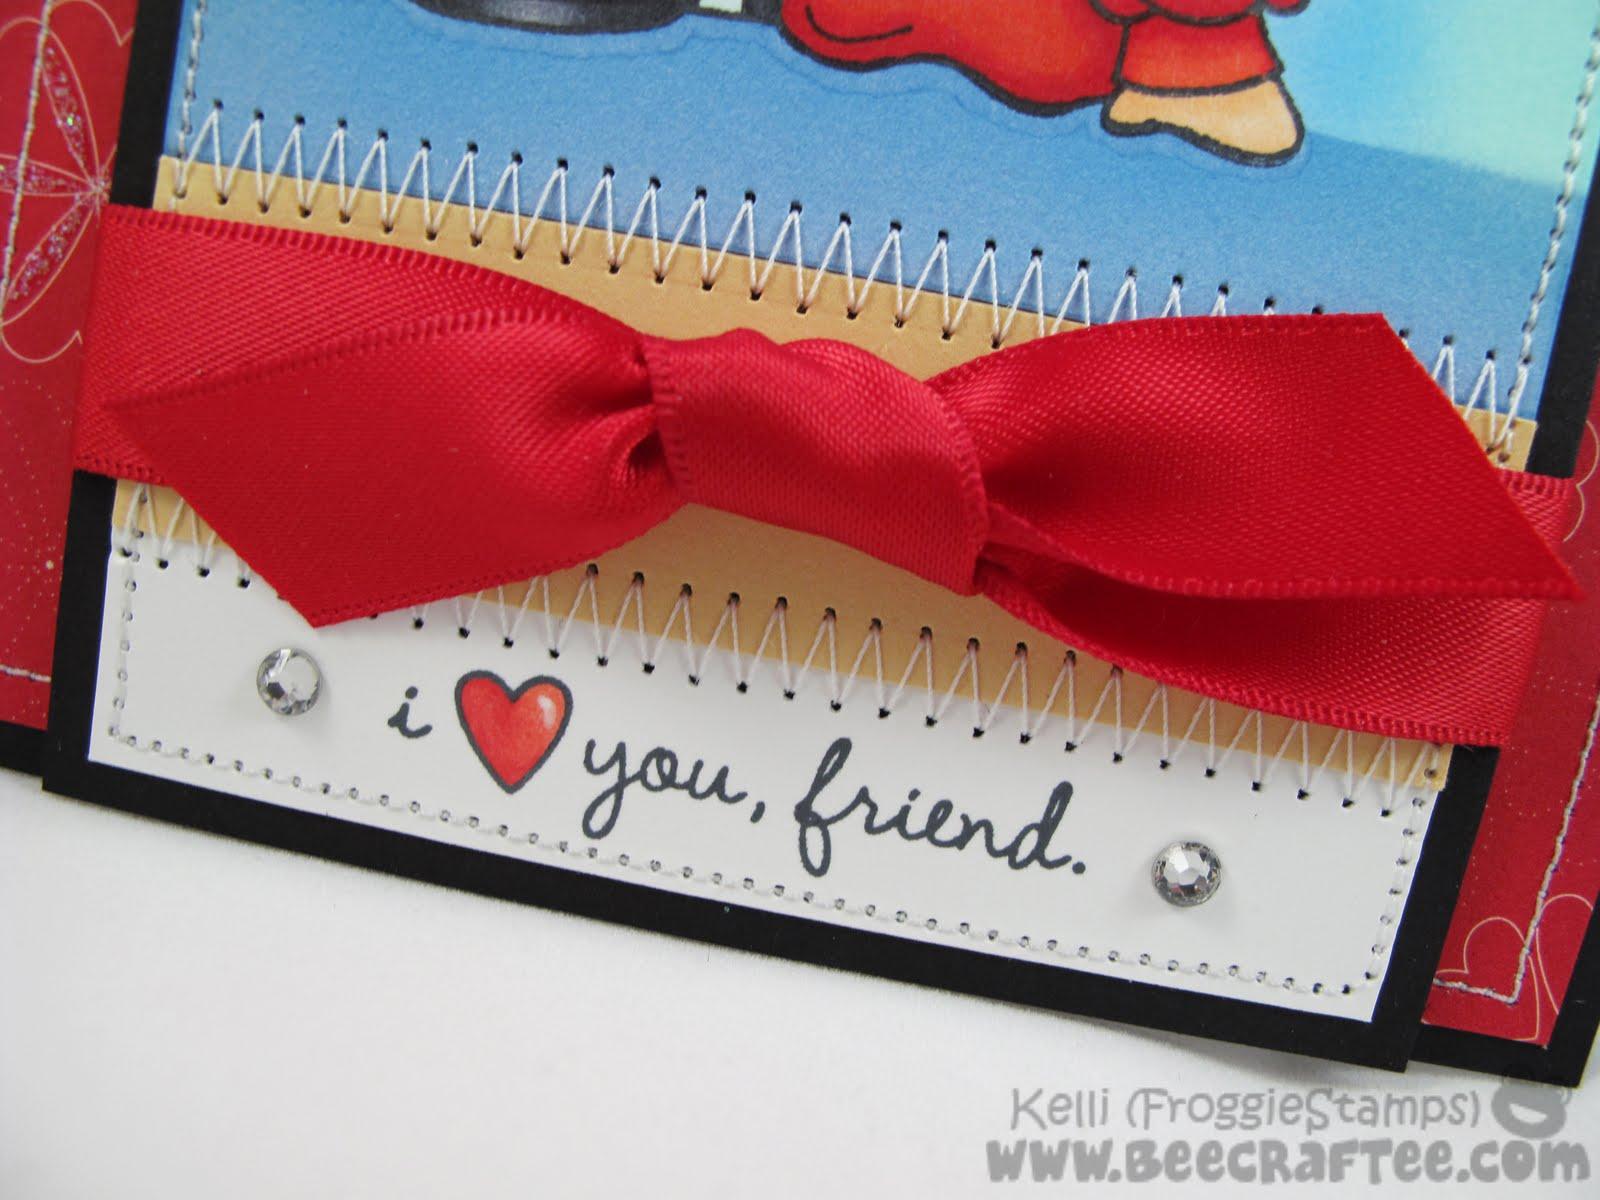 Fullsize Of Love You Friend